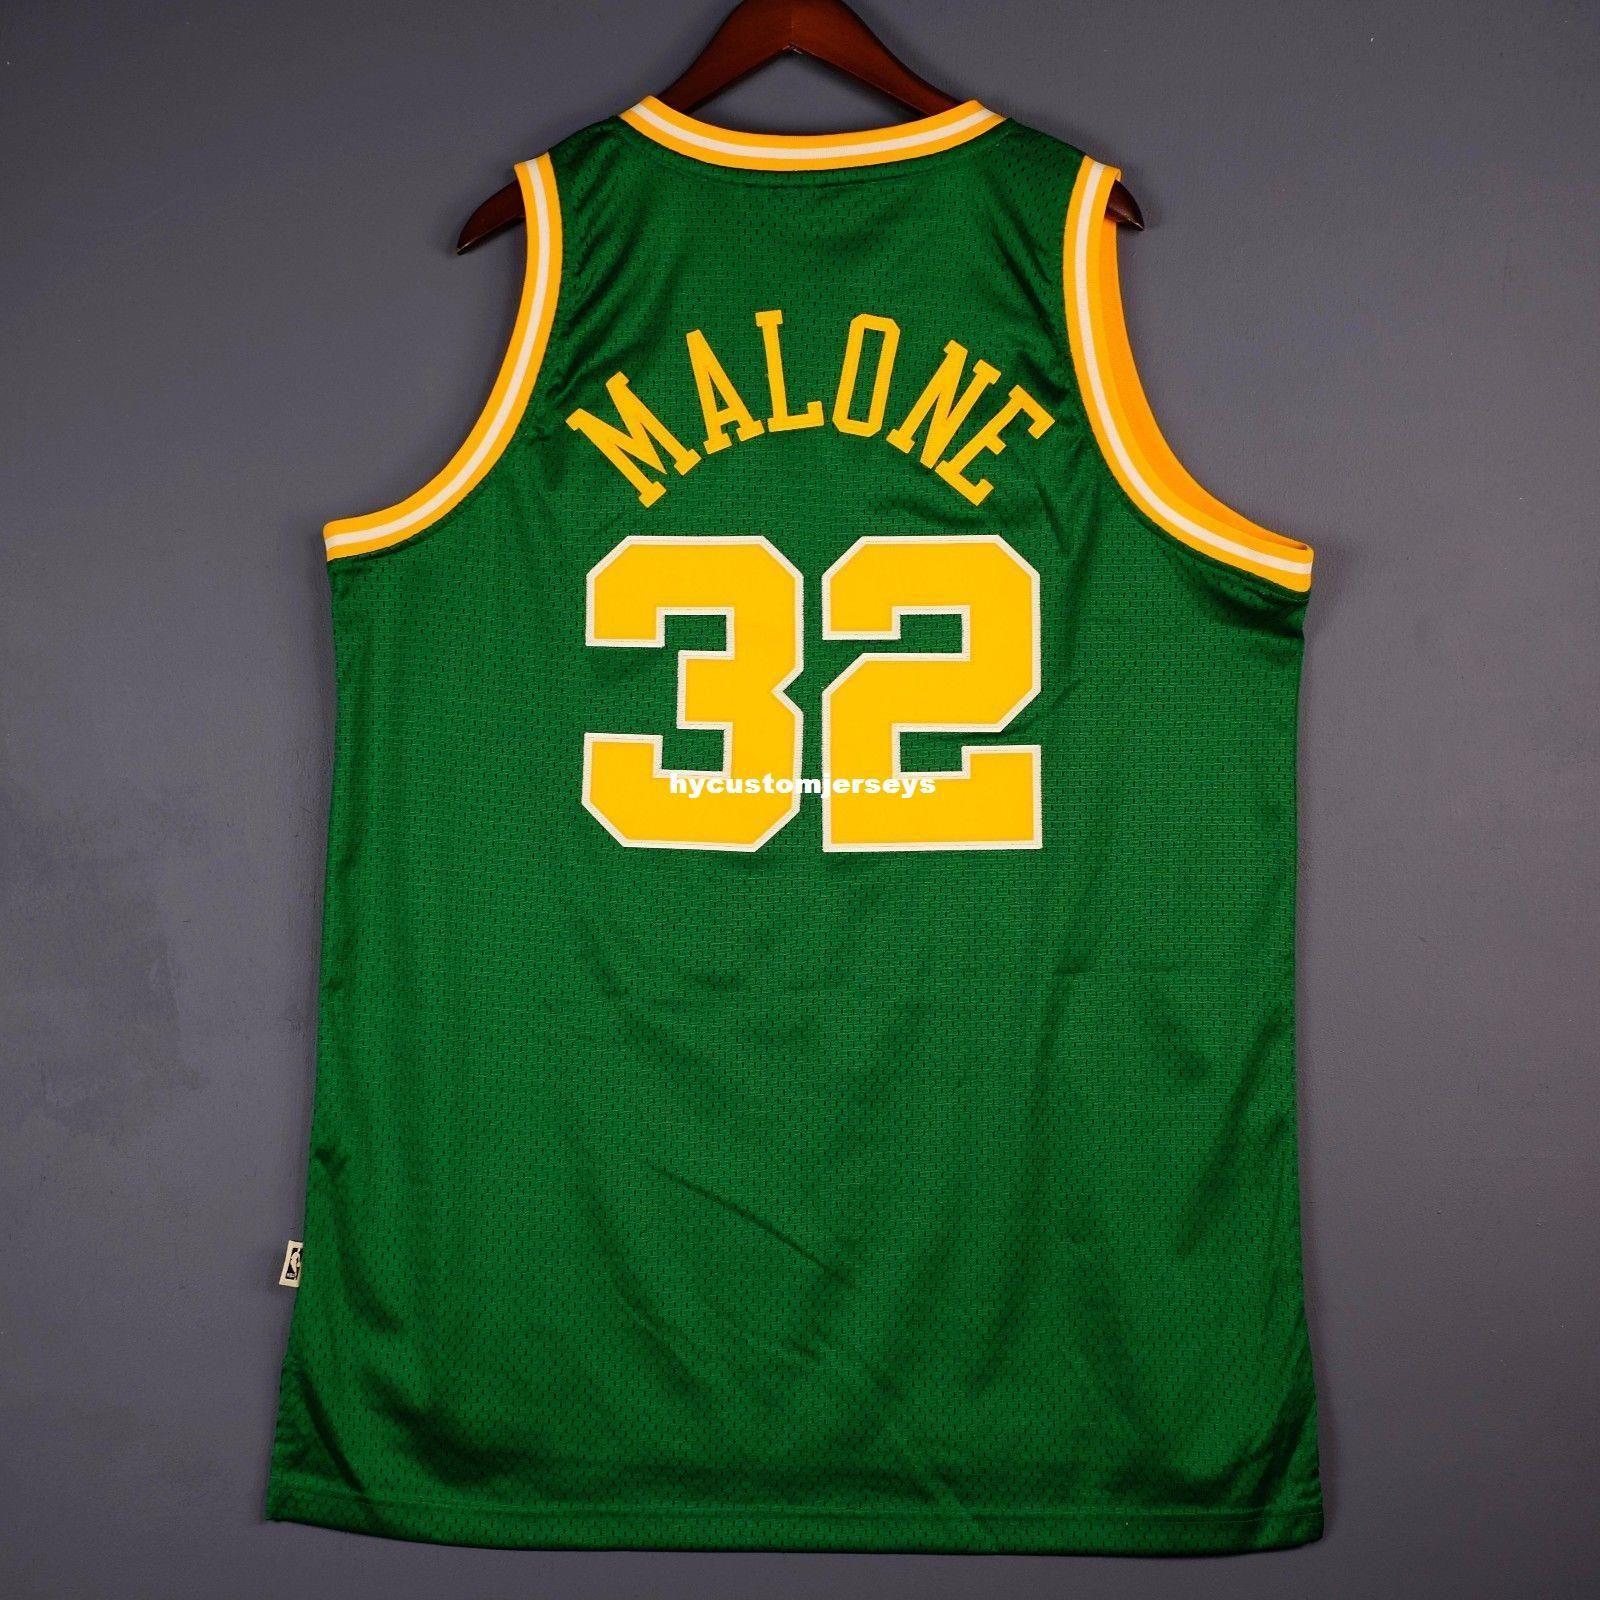 100% Cousu Karl Malone # 32 Âme HWC Vert Cousu Jersey Hommes Gilet Taille XS-6XL Maillots De Basketball Cousu Ncaa